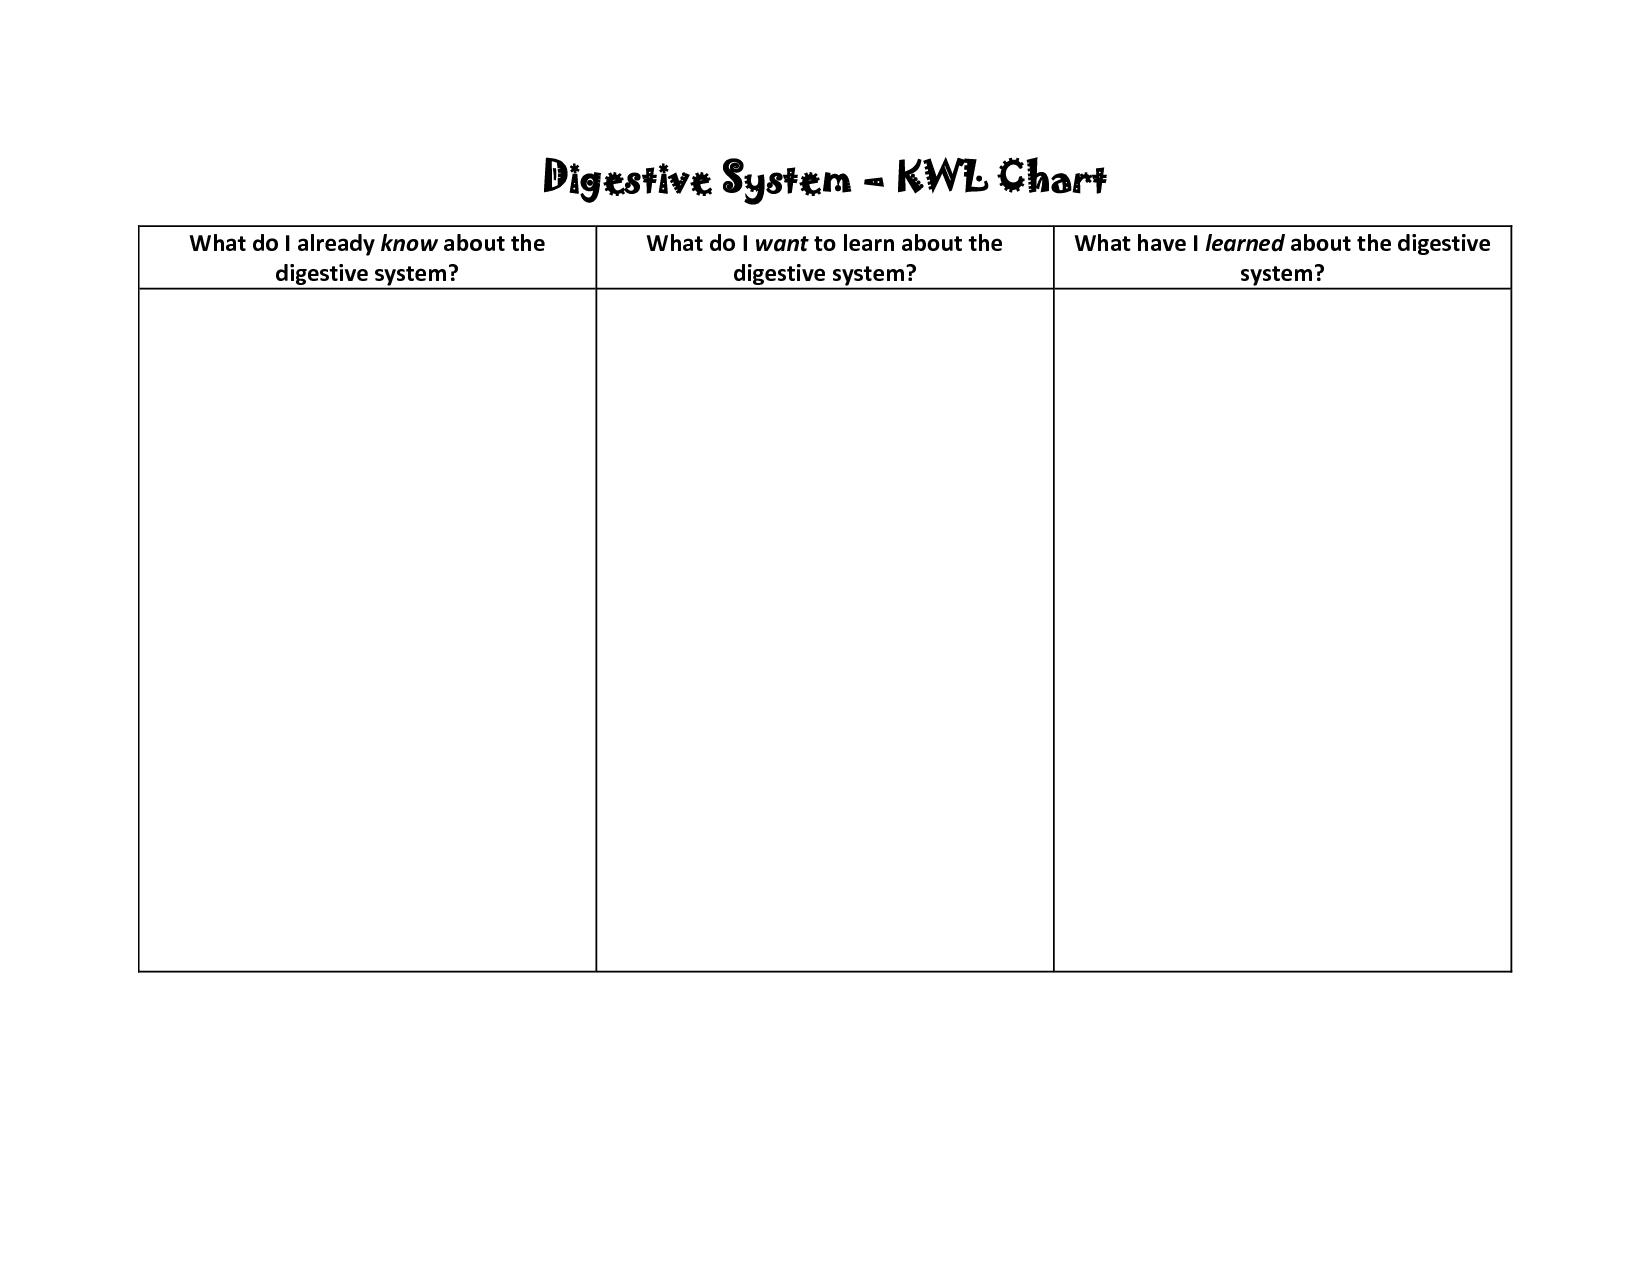 Blank Flow Chart Worksheet Digestive System Kwl Chartwhat Do I